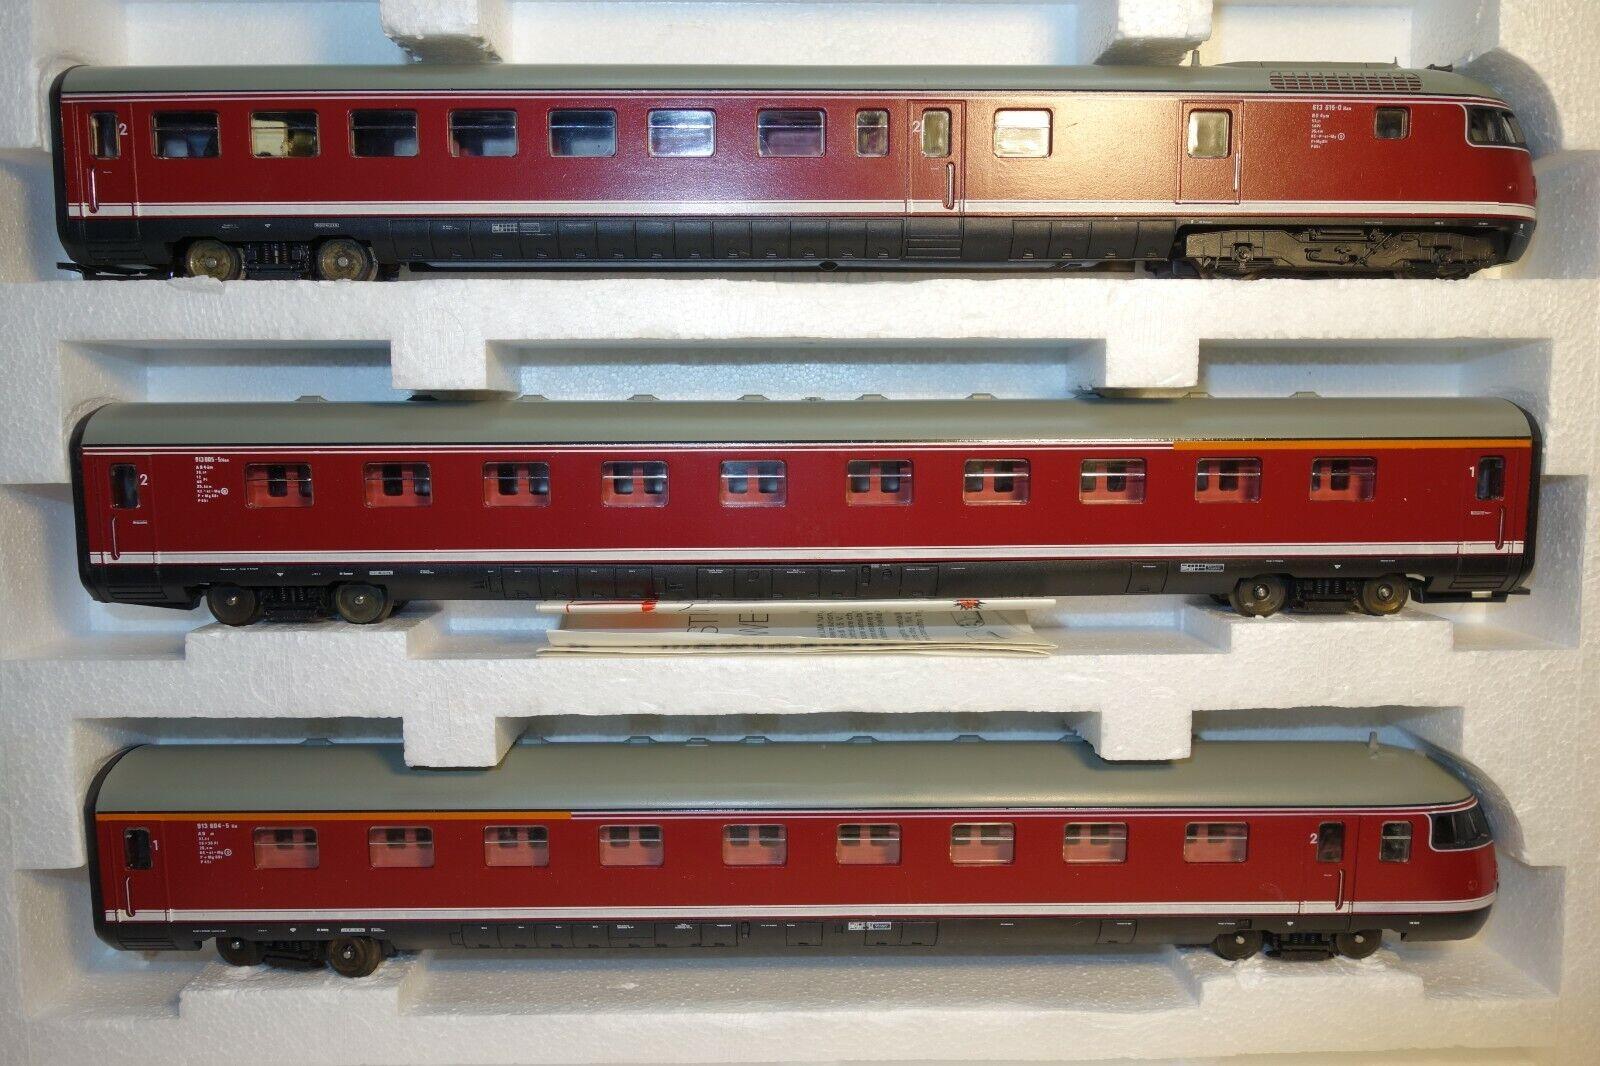 LIMA 149808 DB TRIEBZUG DIESEL BR 613 3 pezzi con scatola originale